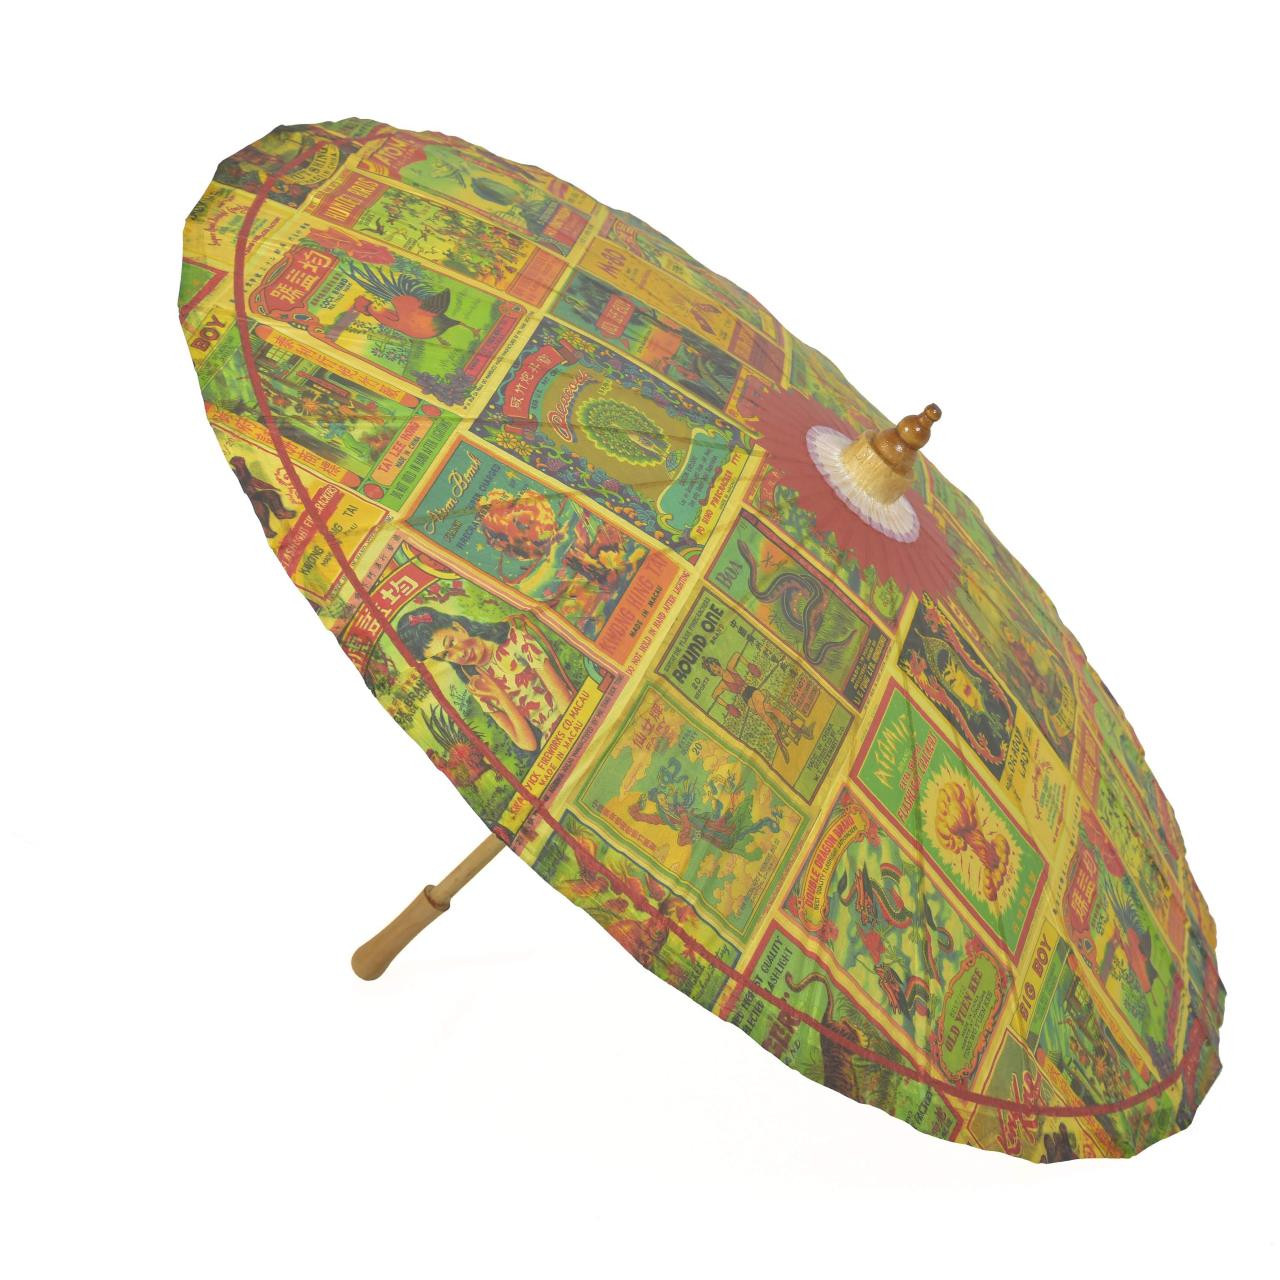 Vintage Firecracker Parasol - 0659682815336